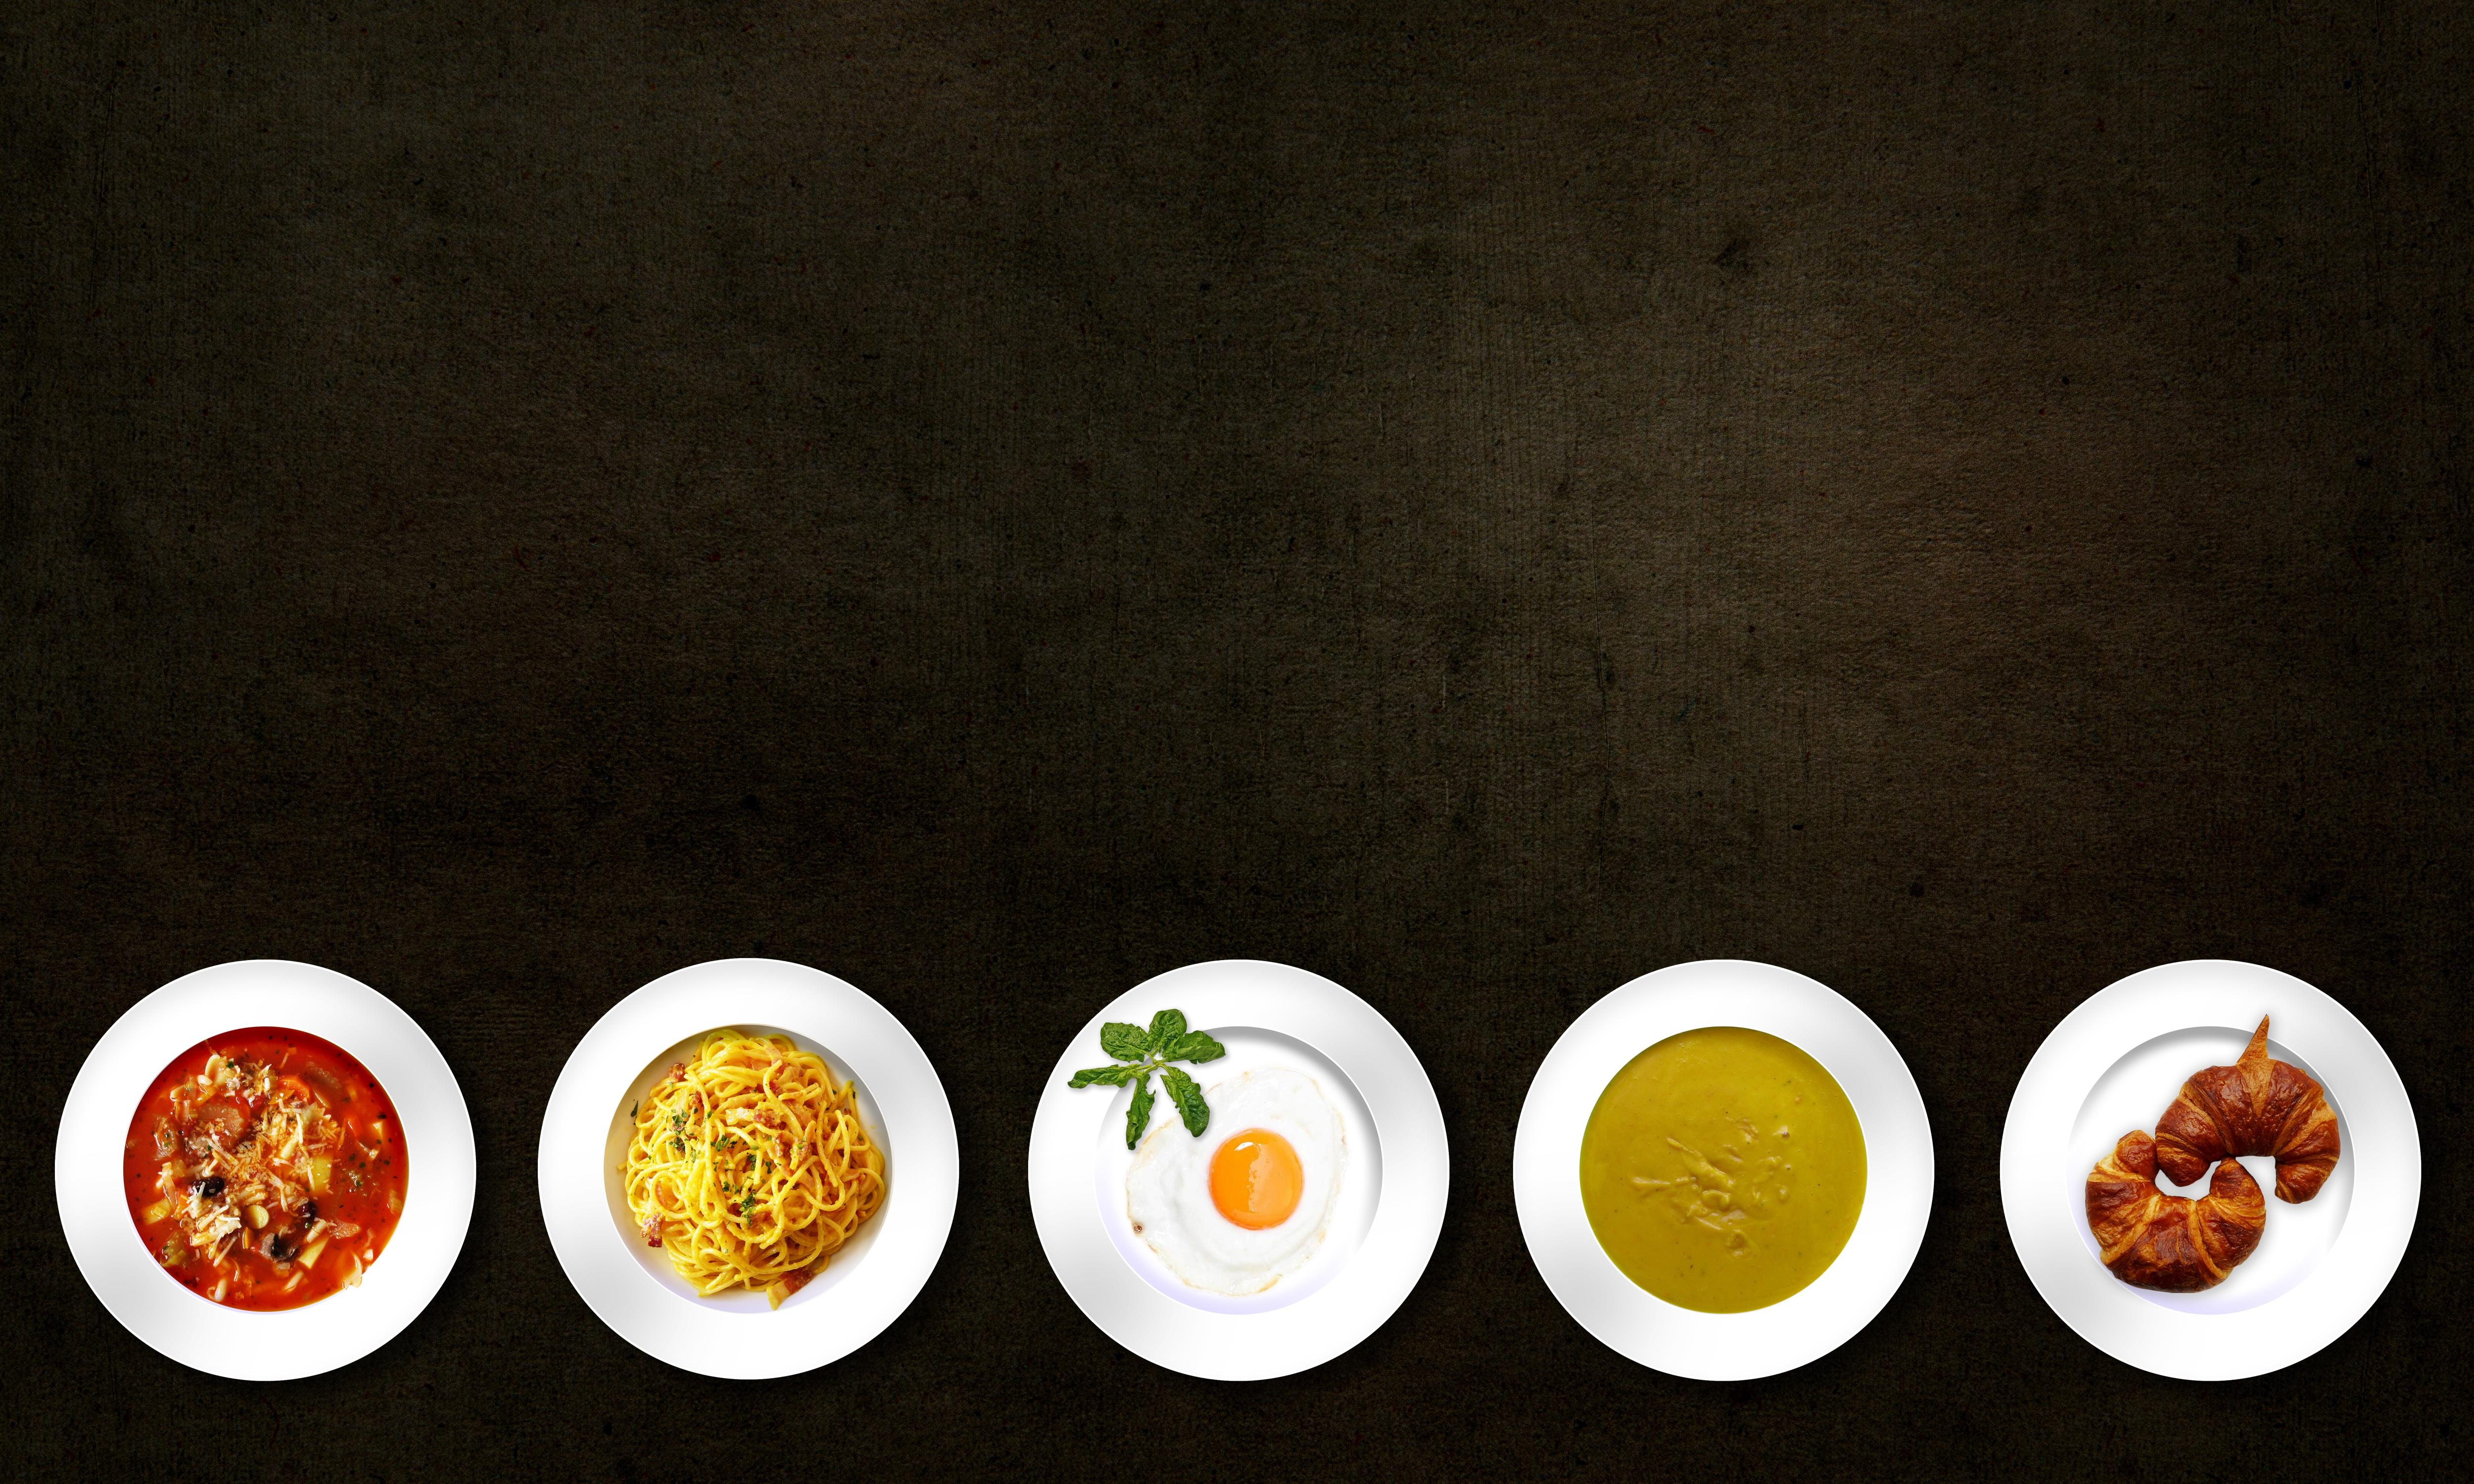 food photography pexels free stock photos